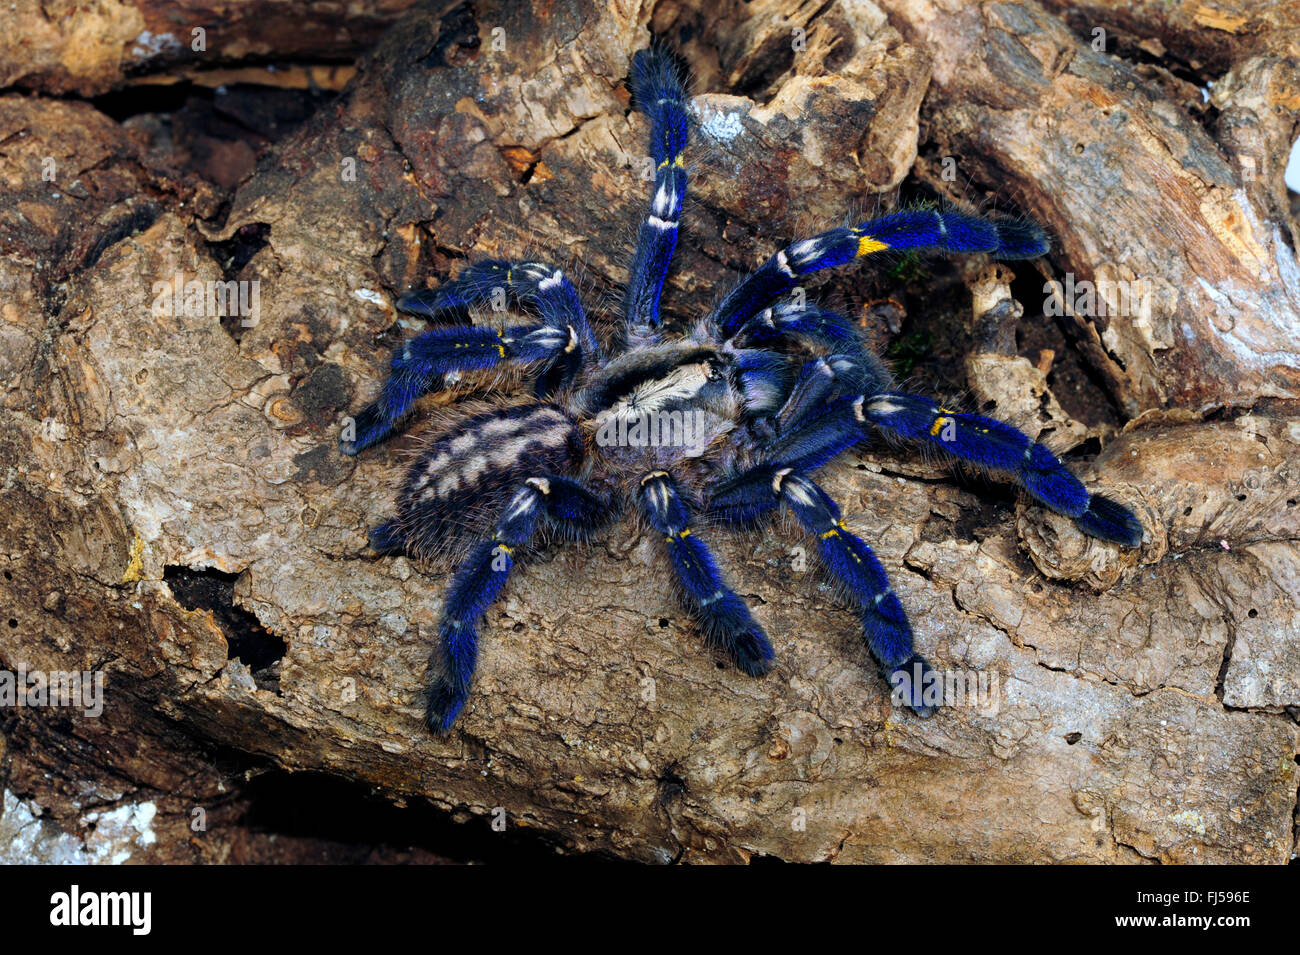 Gooty sapphire ornamental tree spider, Gooty sapphire, Gooty